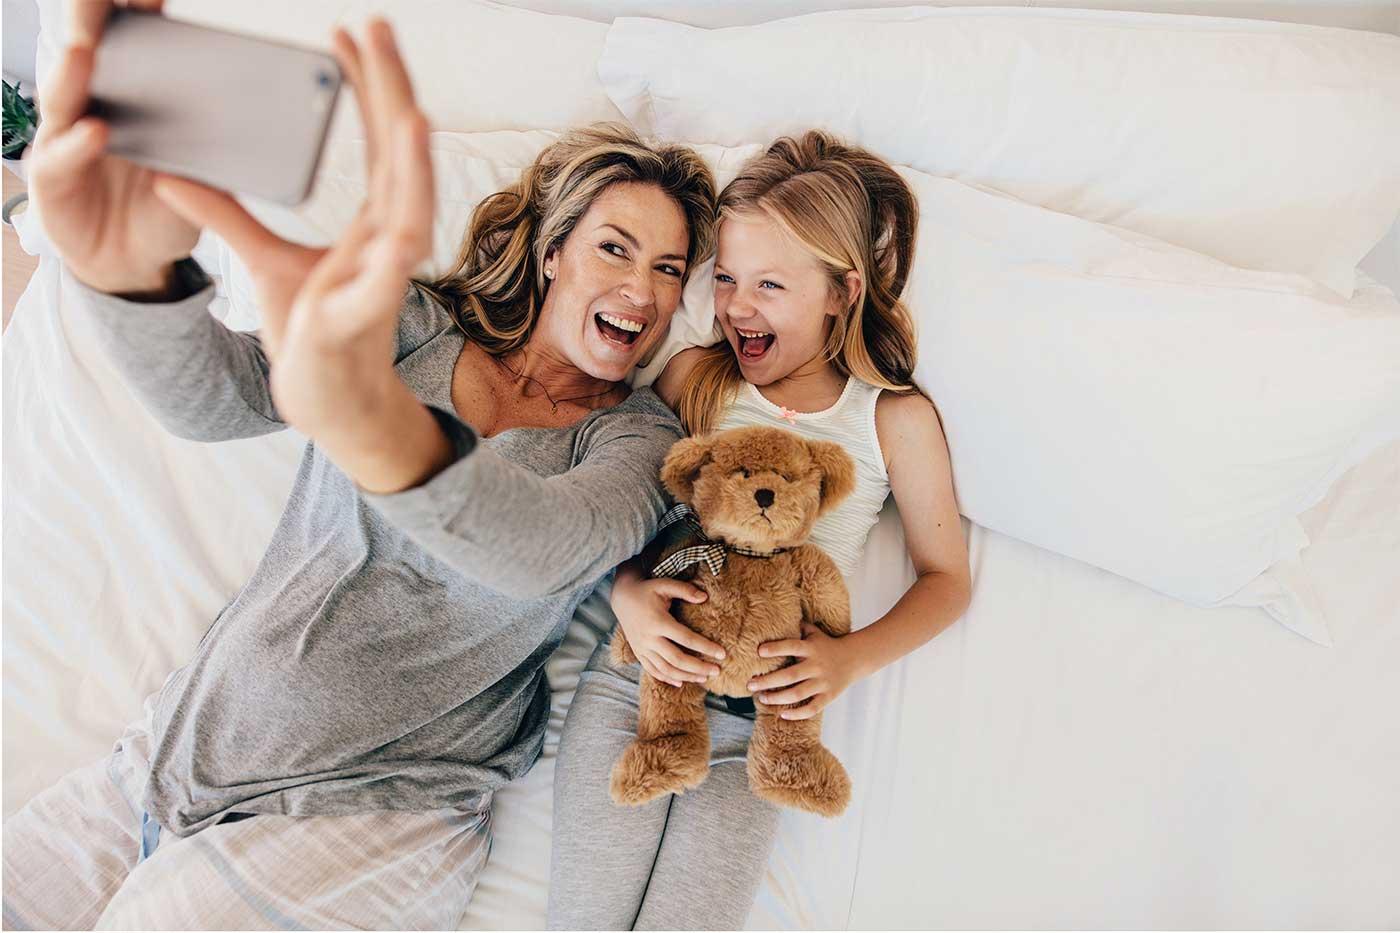 The dangers of raising narcissistic children